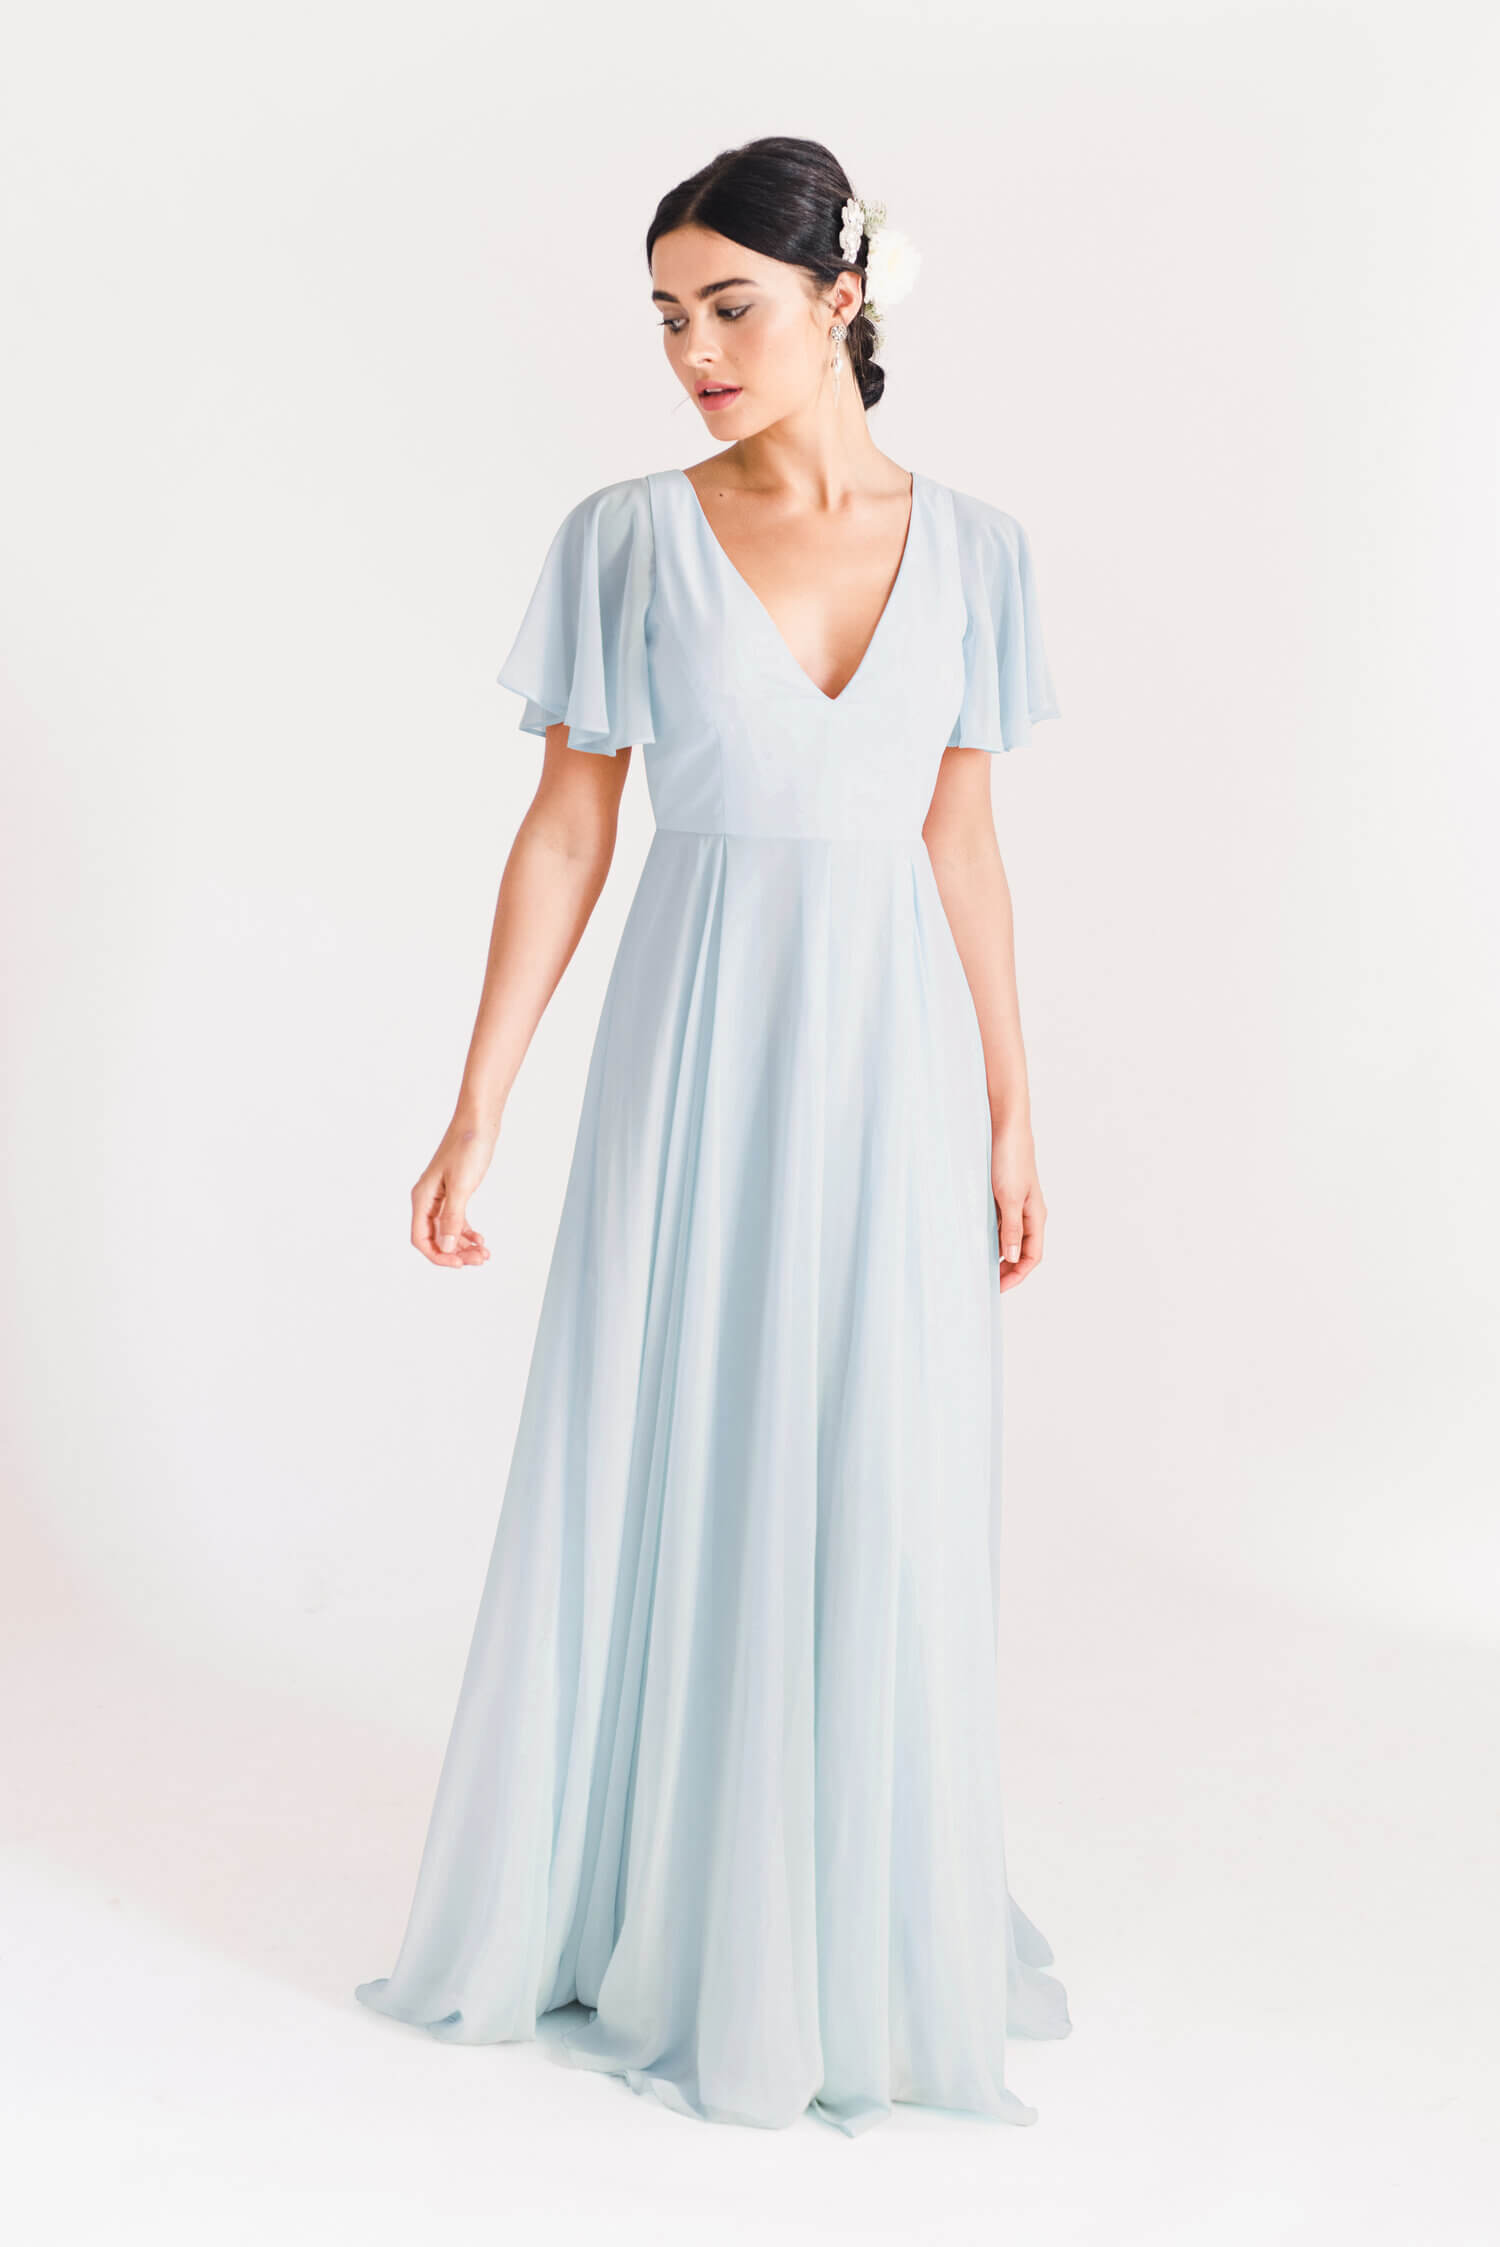 TH&H Phoebe Bridesmaid Dress TH&H Bridesmaid Dress Blue